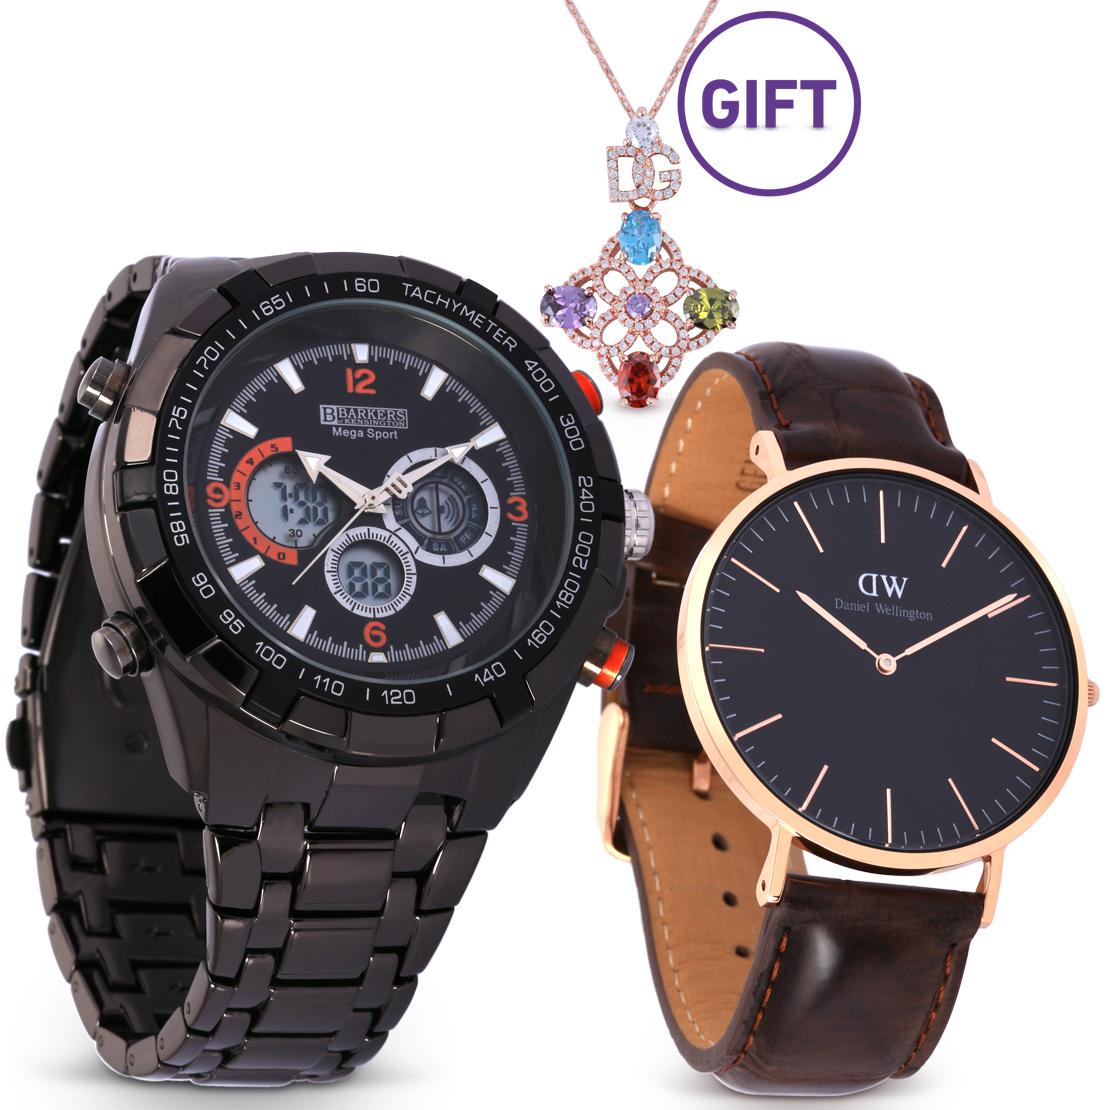 Mega Sport Black Watch & Gifts